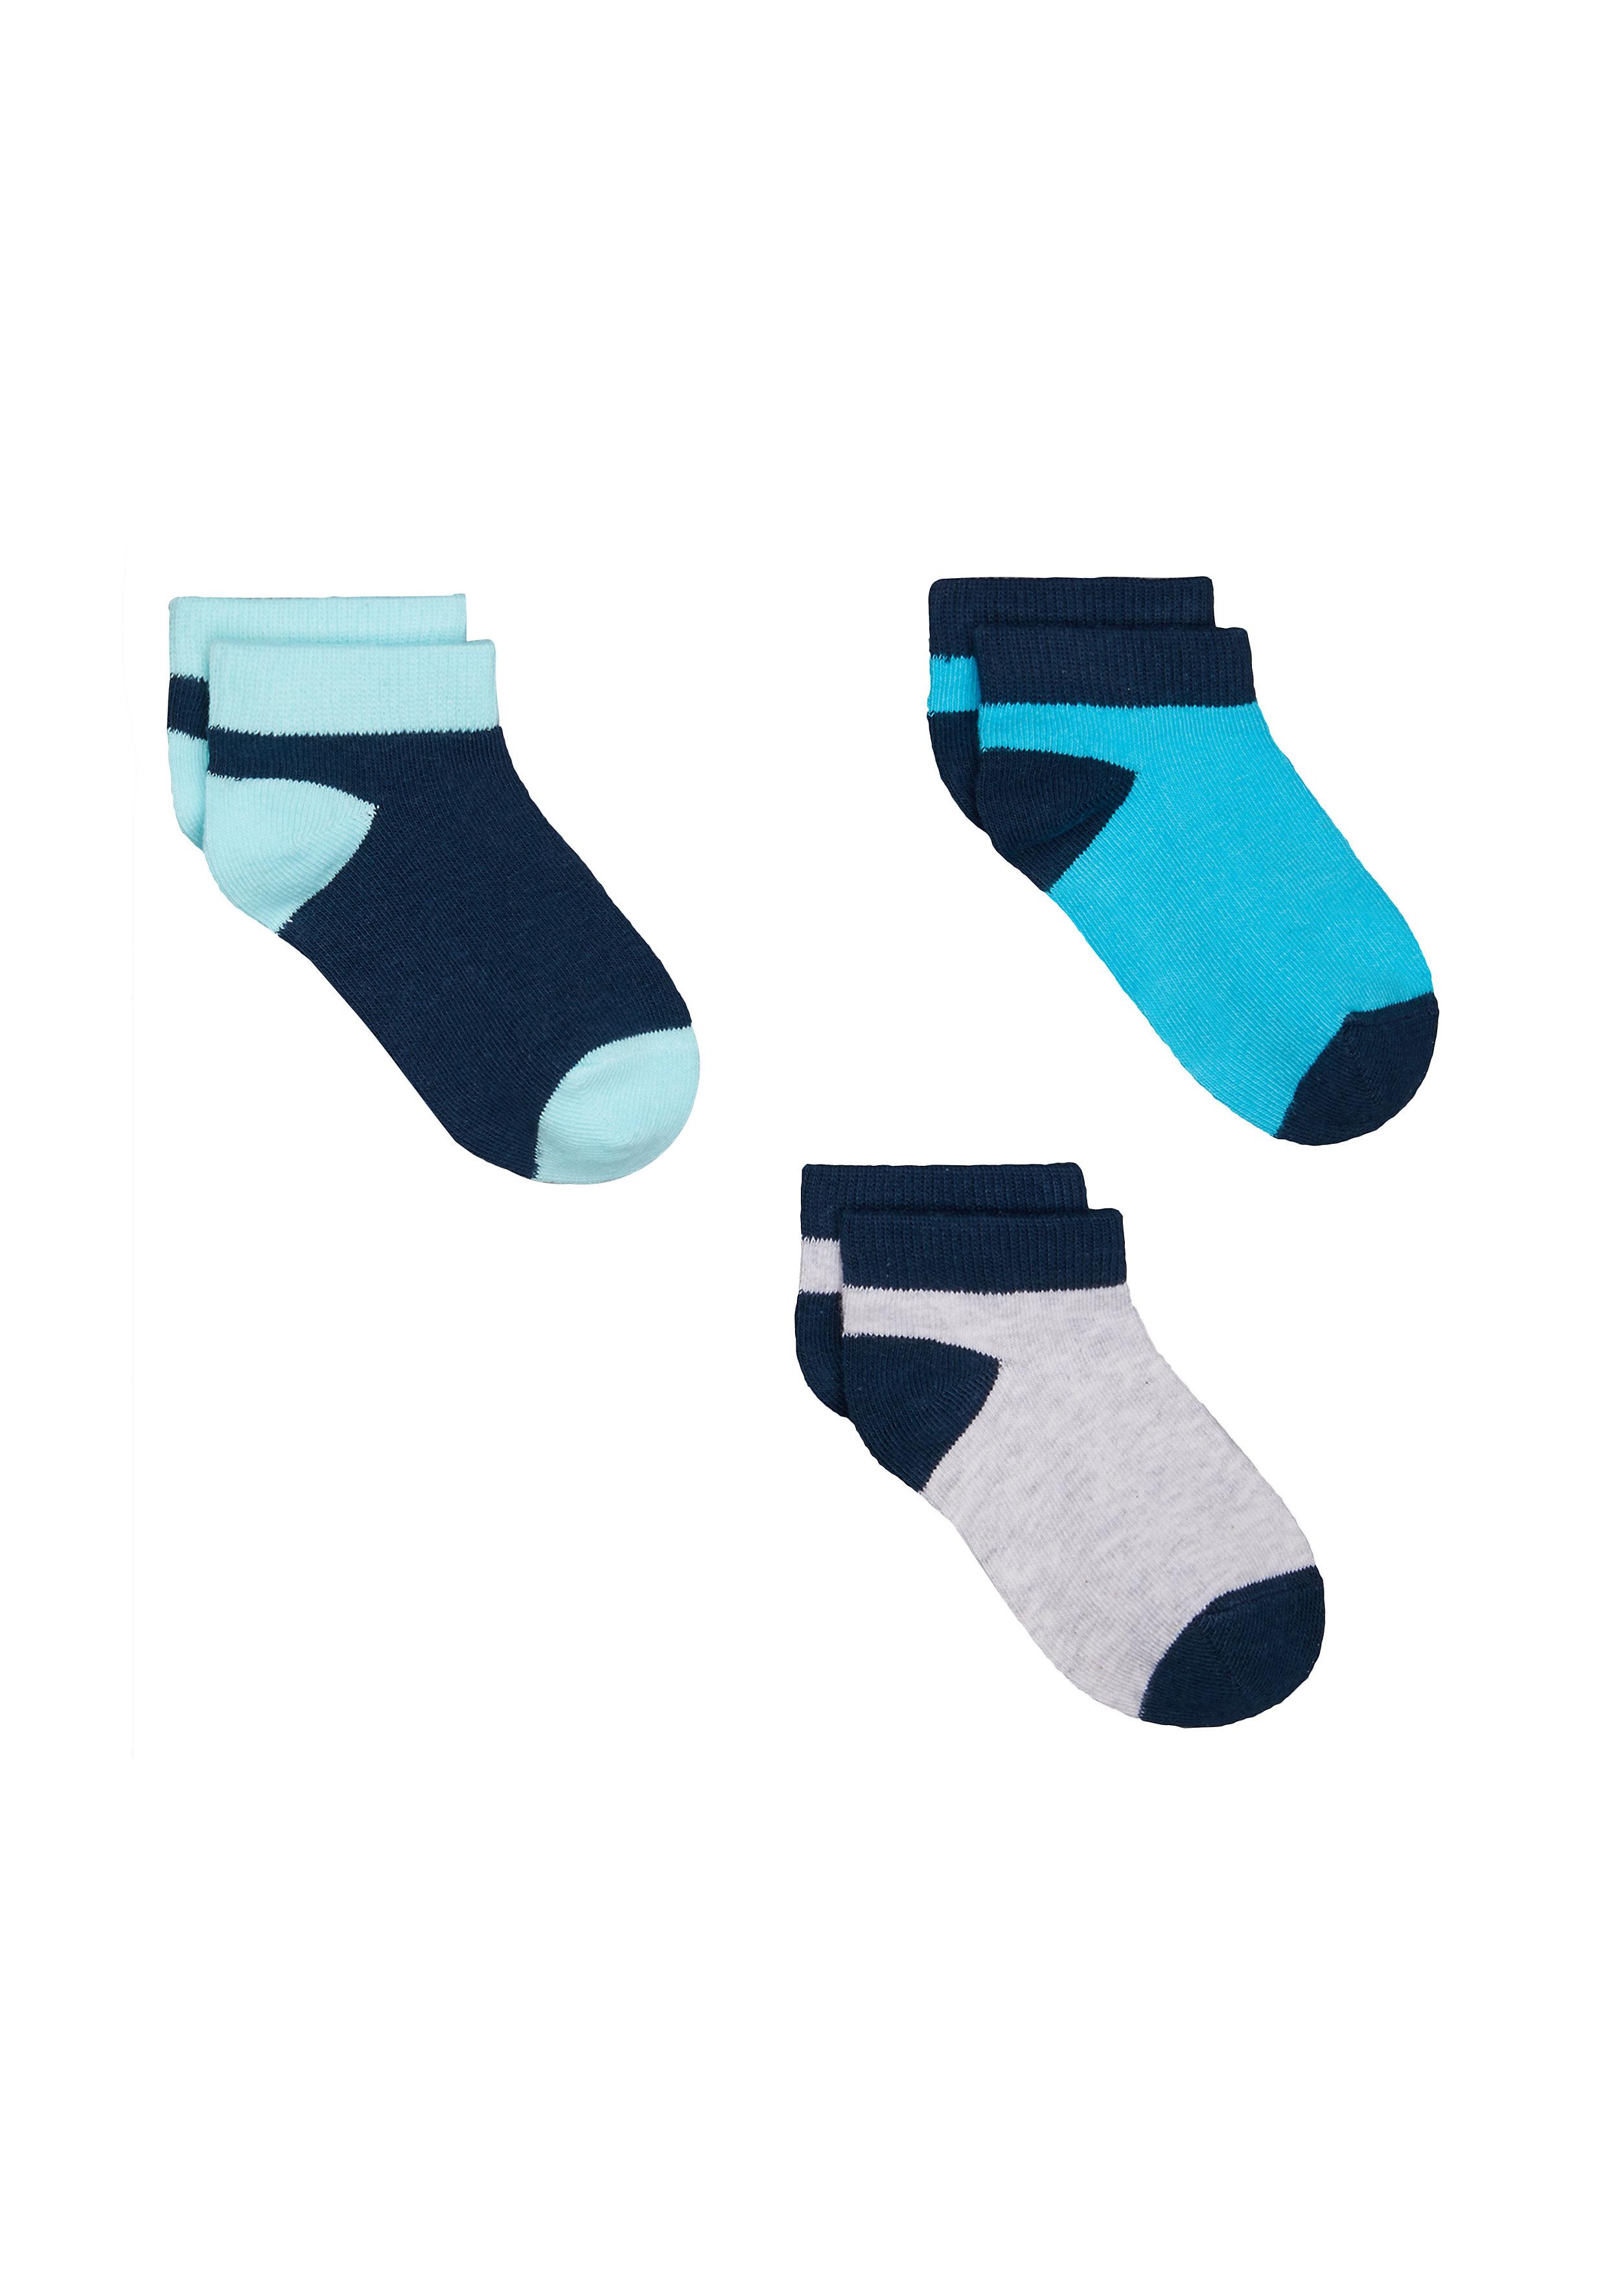 Mothercare | Boys Blue Trainer Socks - 3 Pack - Blue